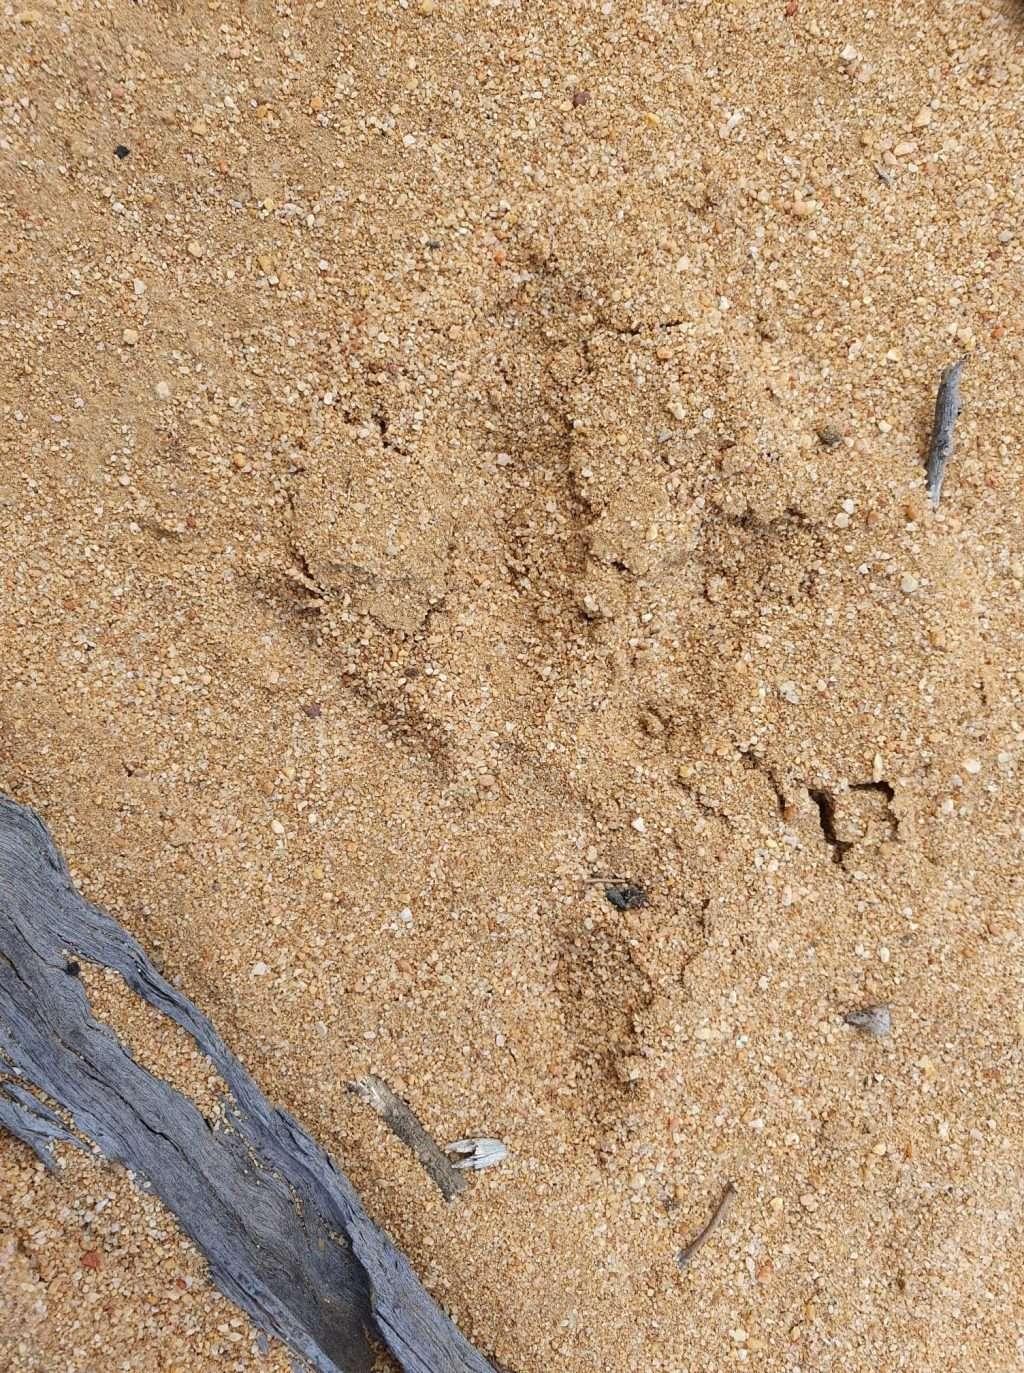 WABARL (BADIMIA LANGUAGE FOR MALLEEFOWL LEIPOA OCELLATA) FOOTPRINT. PHOTO BY JARNA KENDLE, NACC NRM